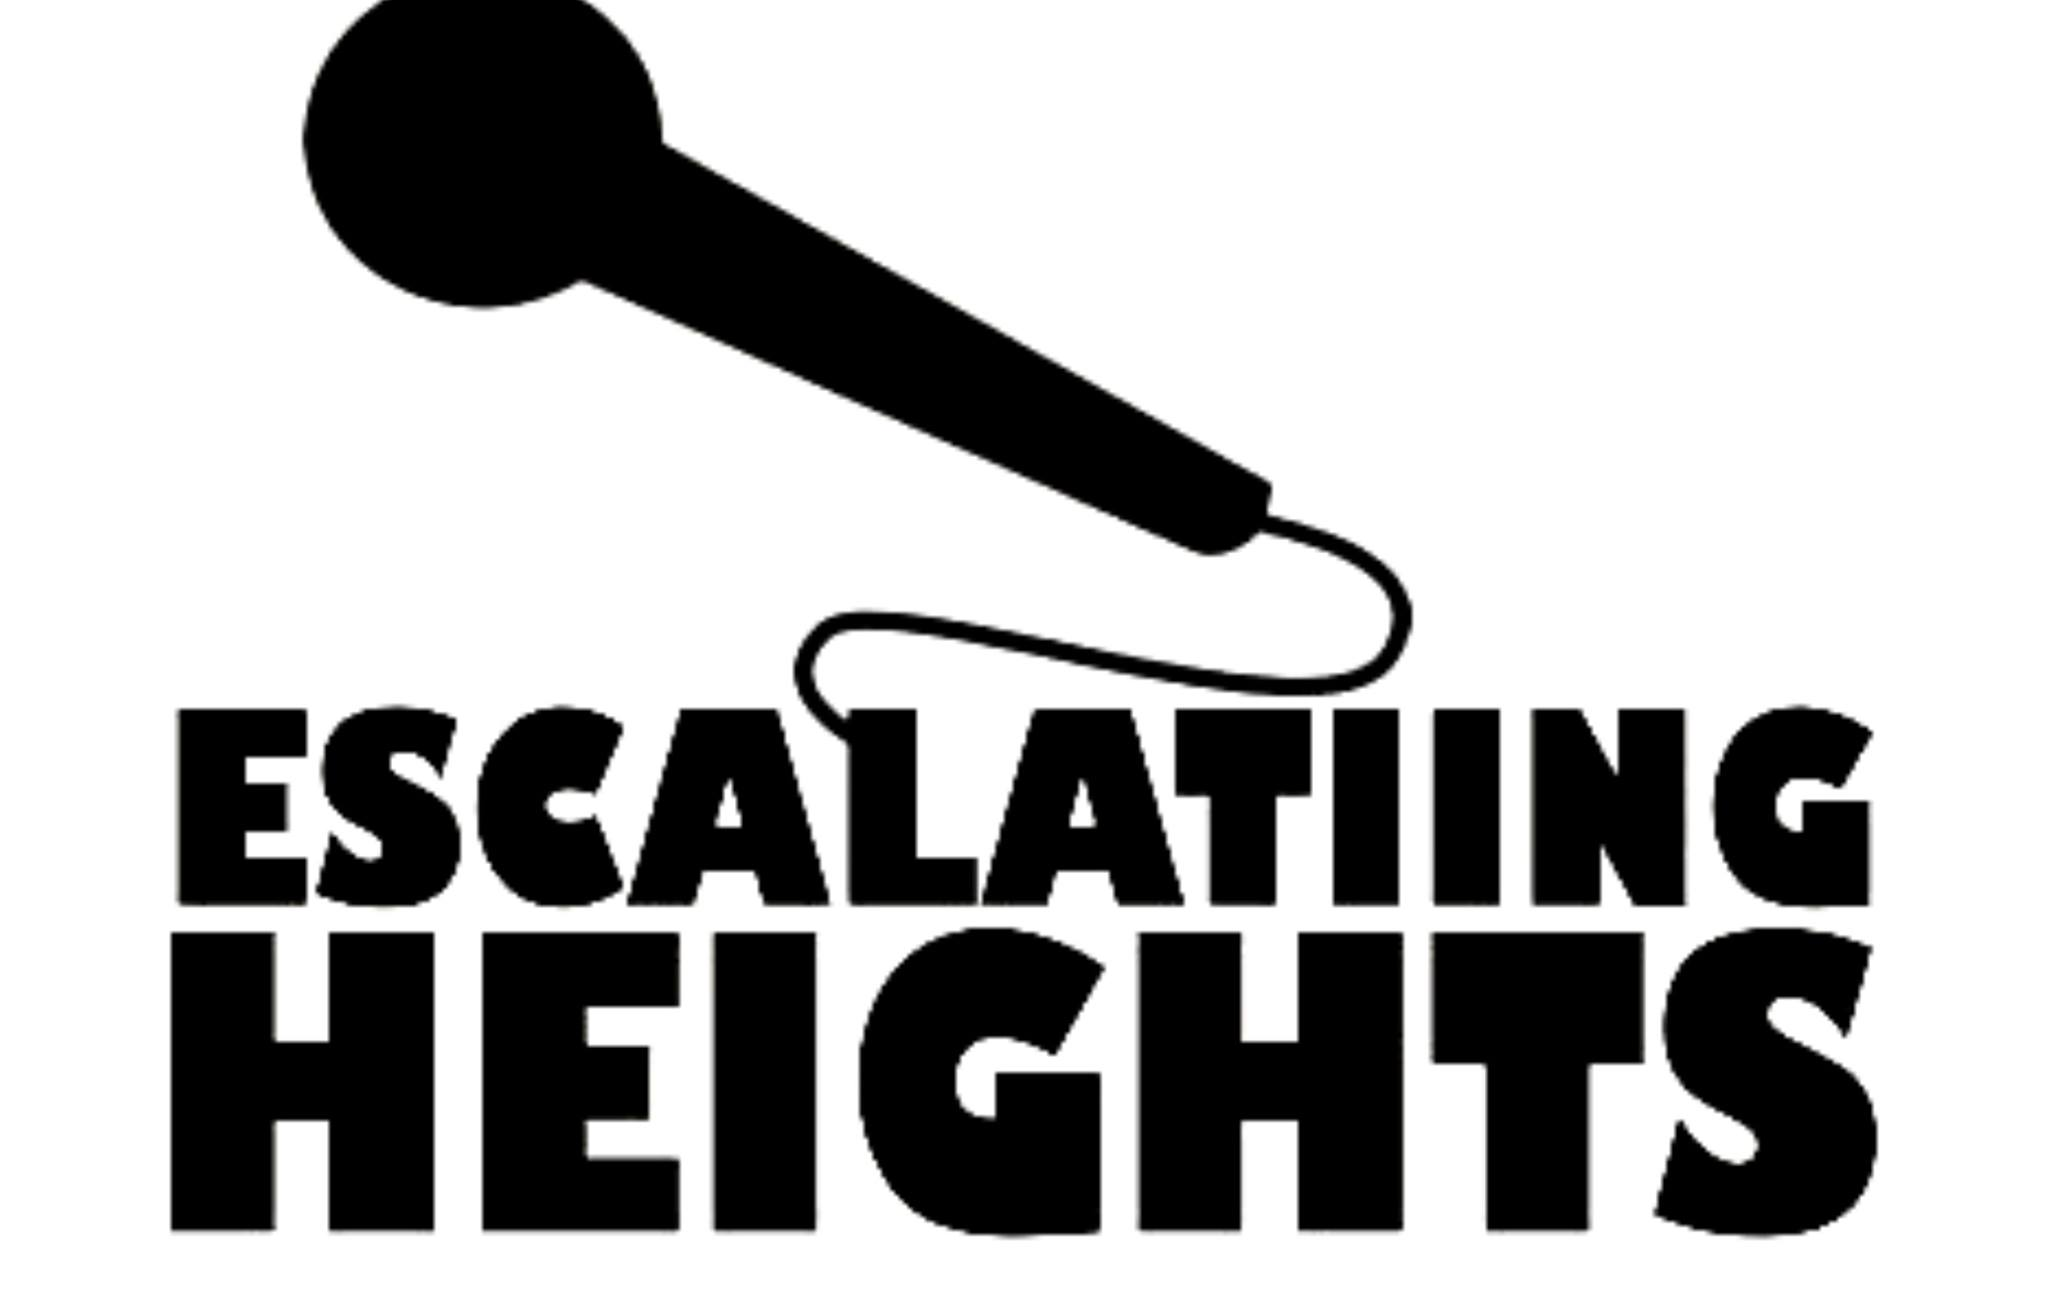 escalating heights.jpg